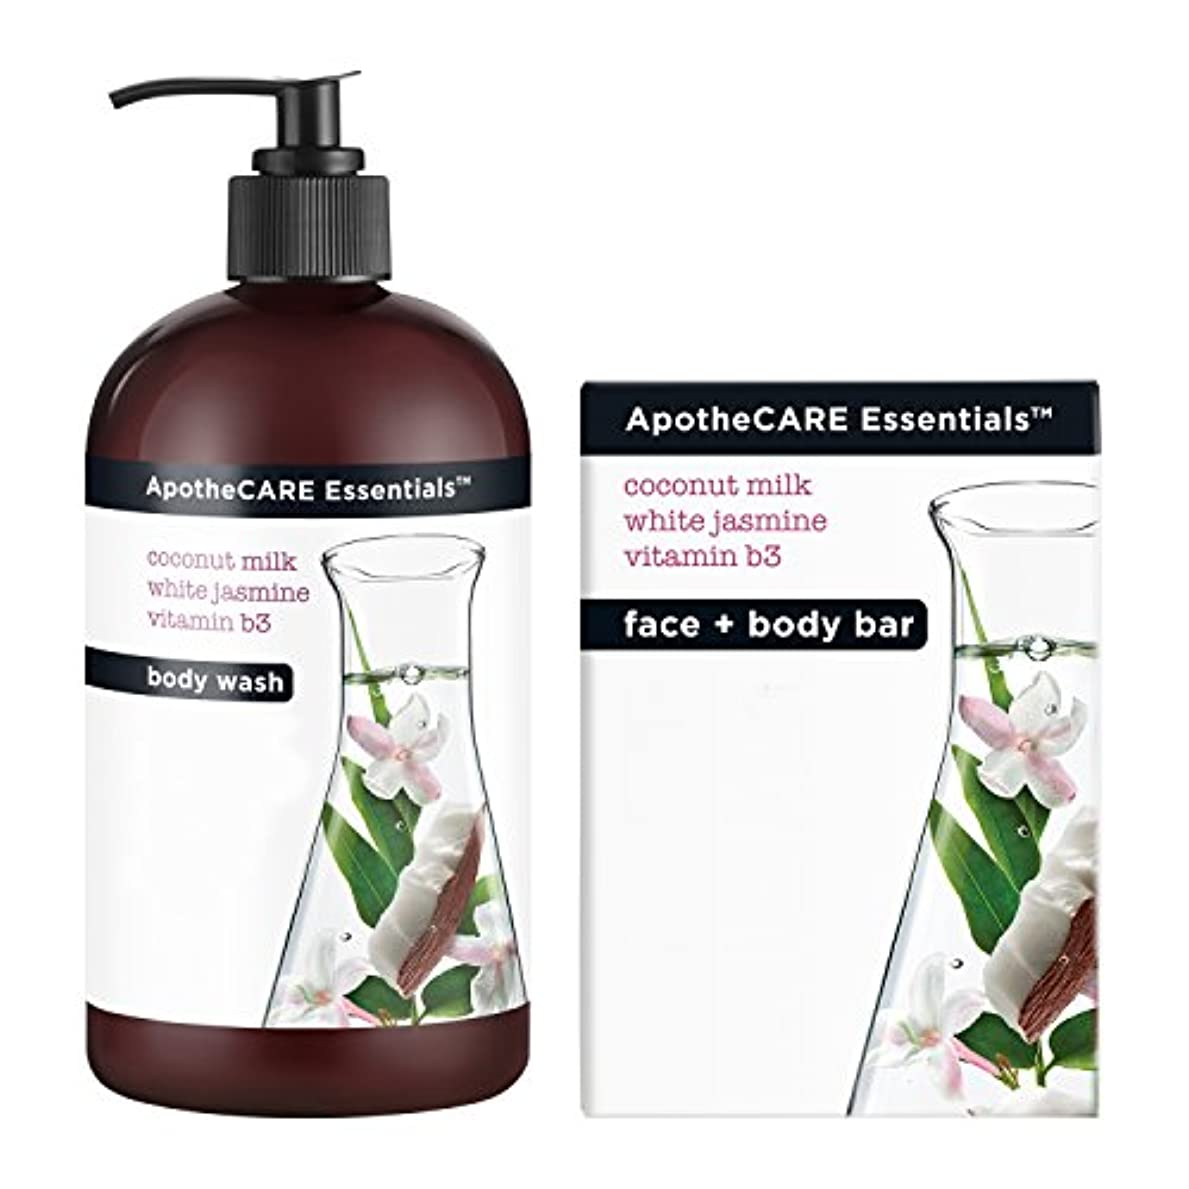 Body Wash and Bar Soap, Coconut Milk, White Jasmine, Vitamin B3, 16 oz 473 ml